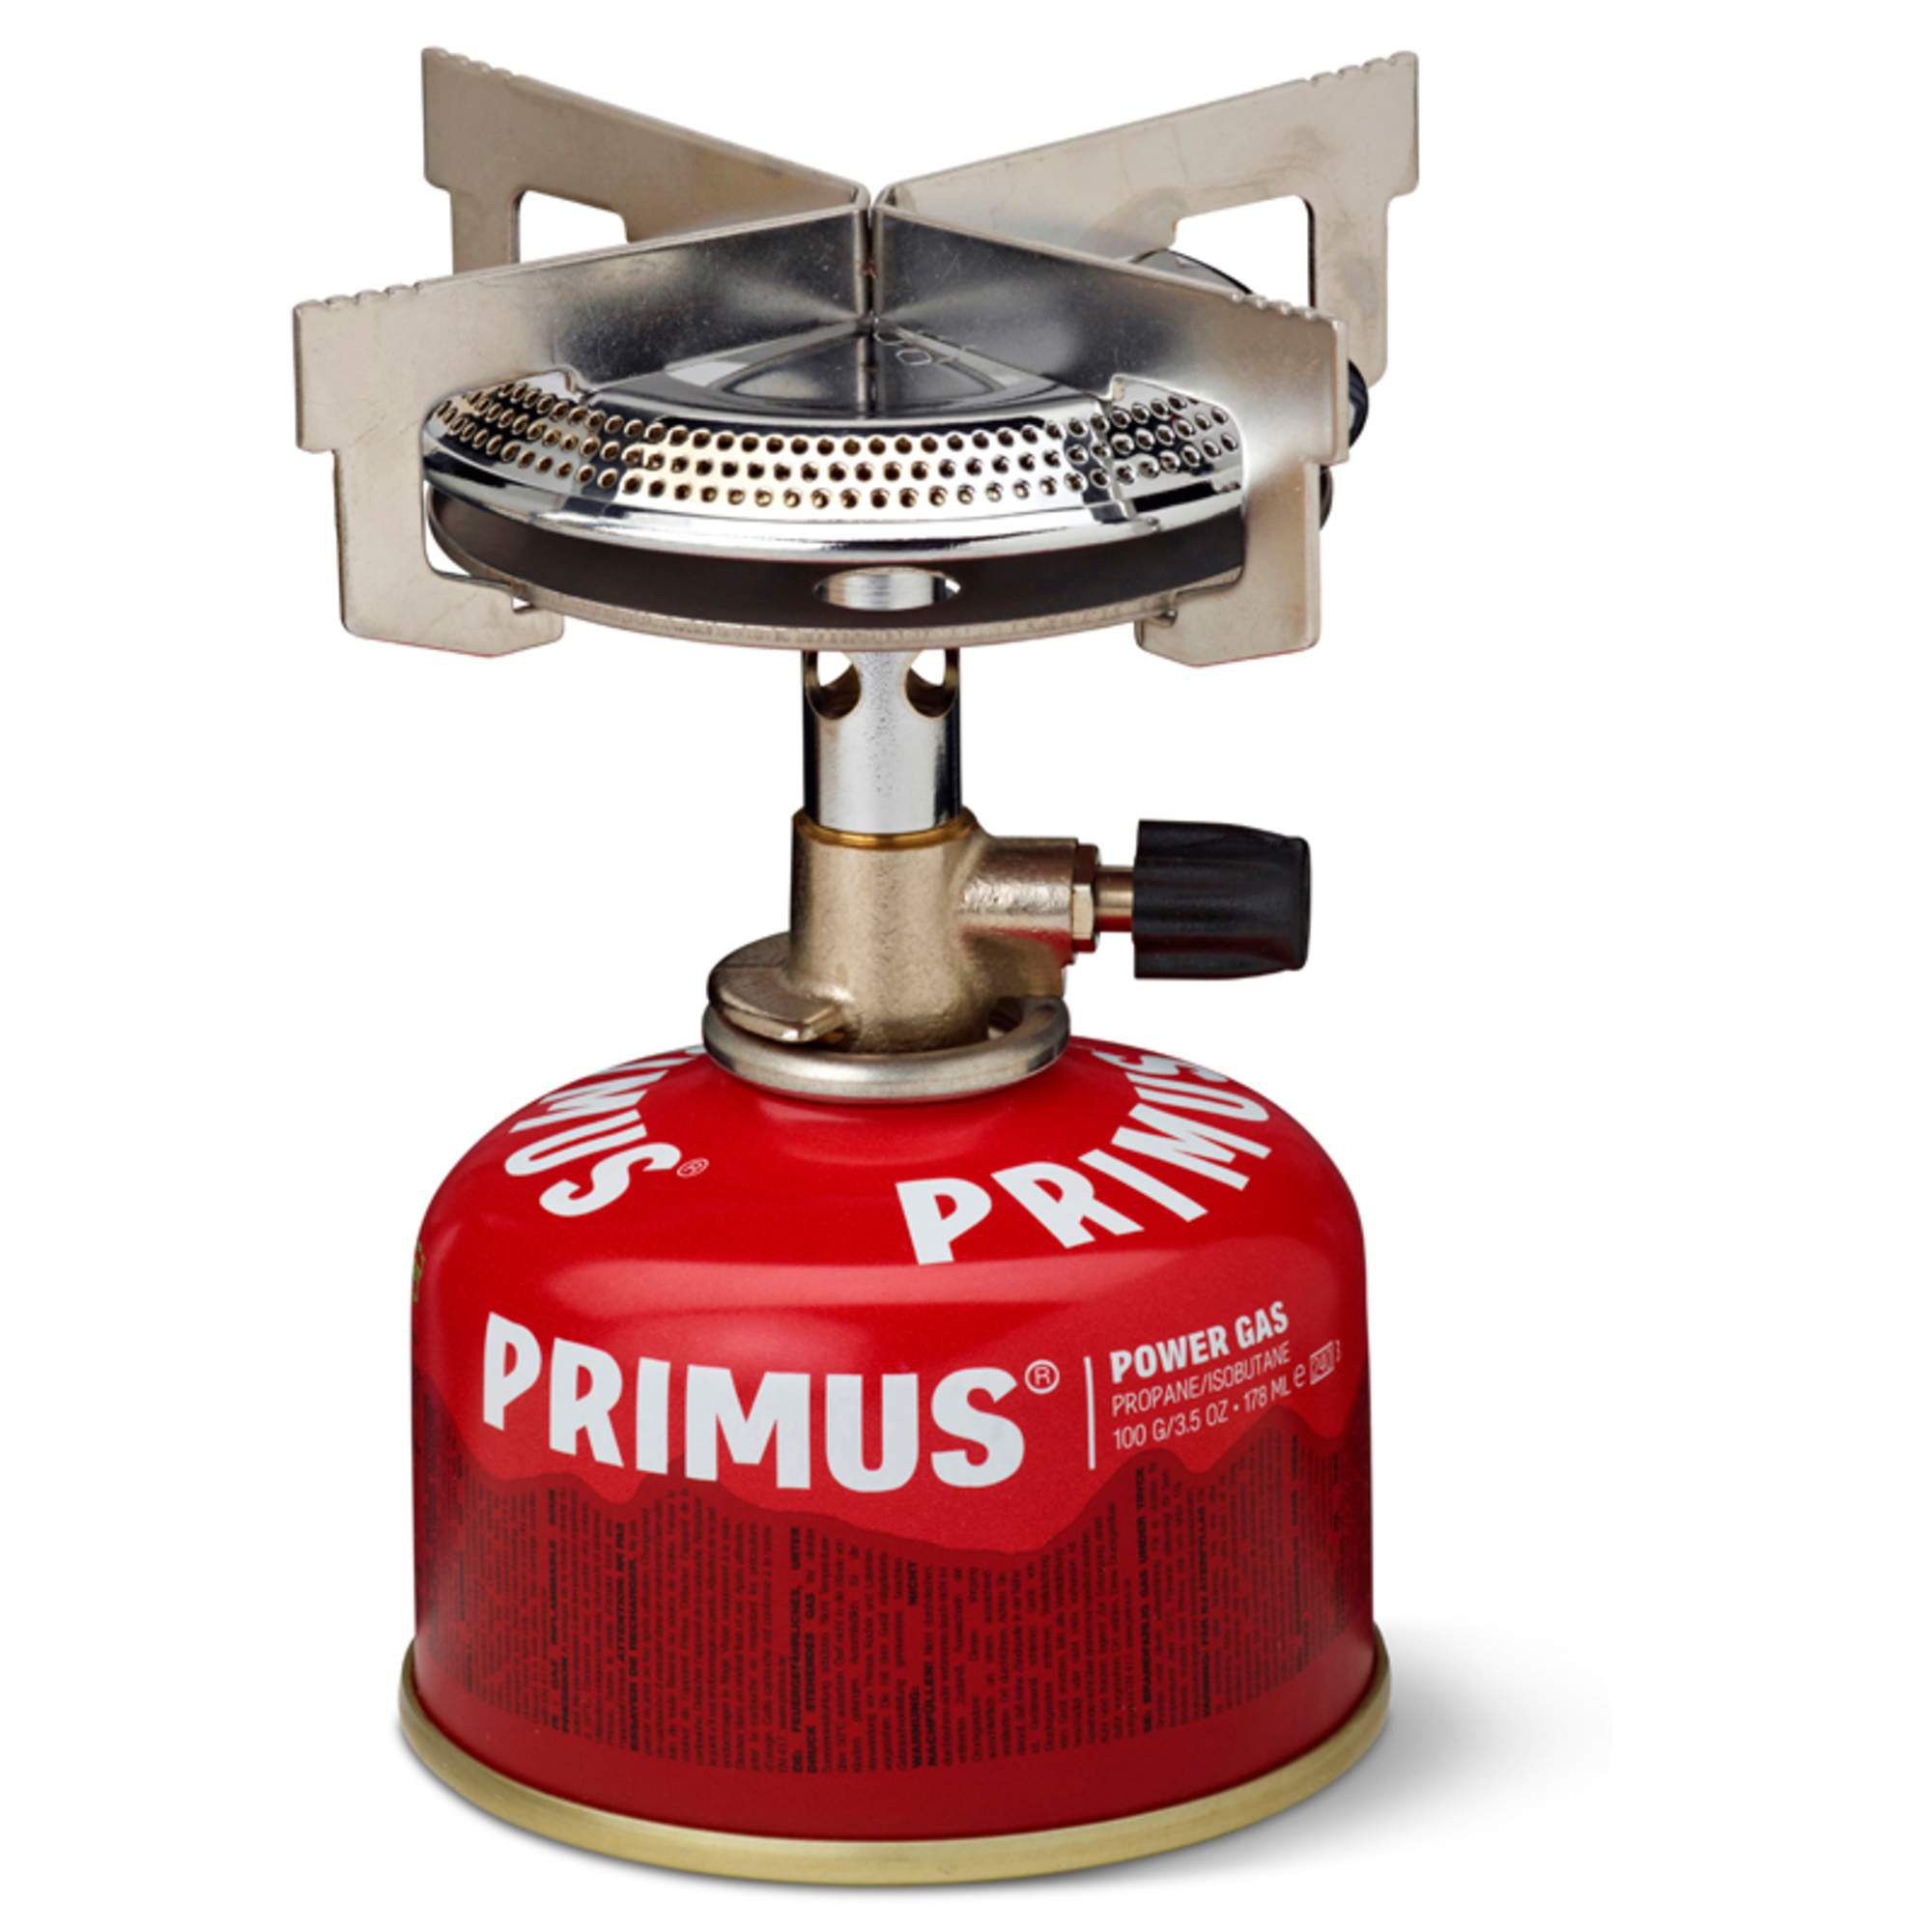 Réchaud Primus Mimer Duo Stove